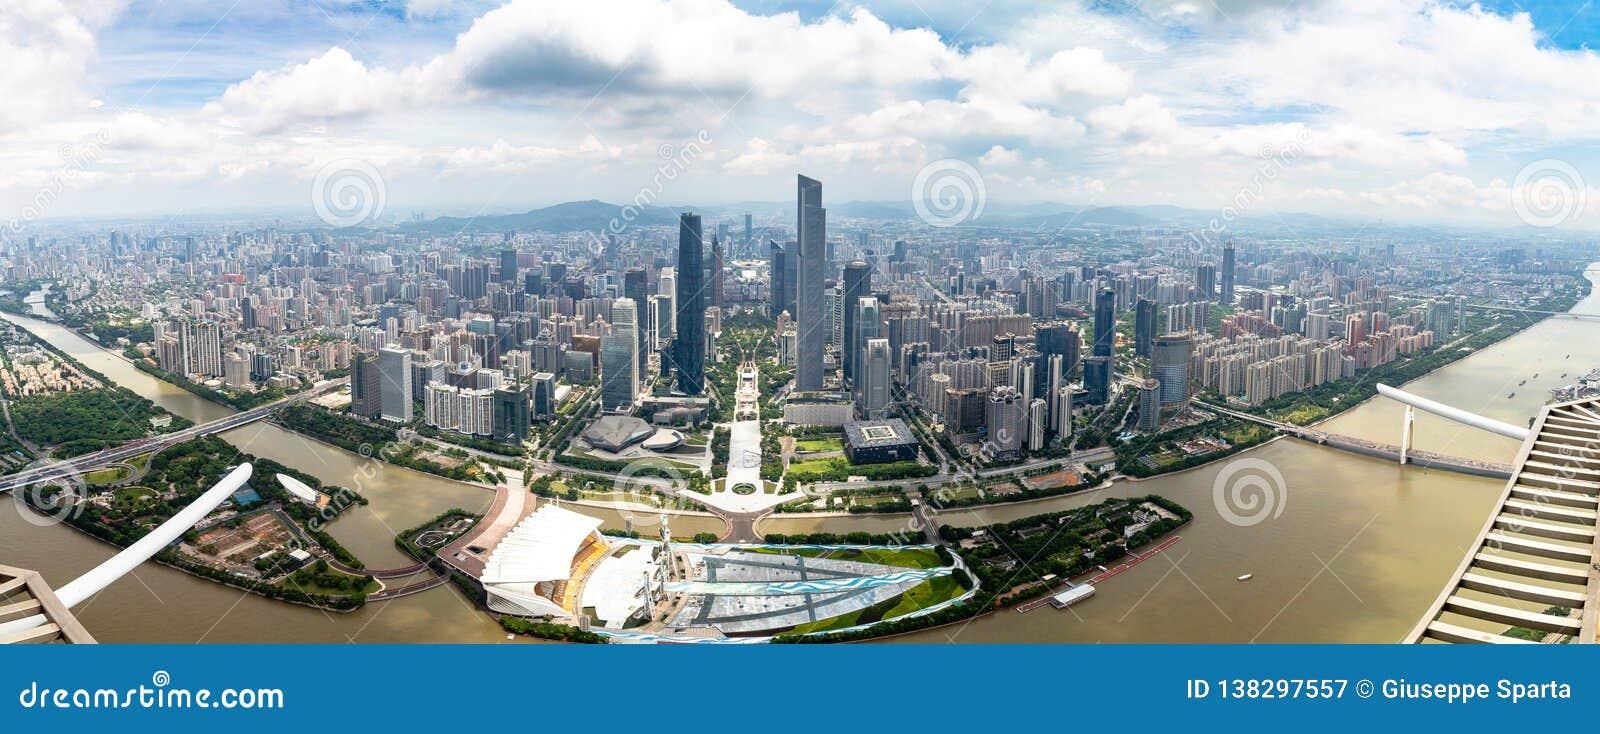 "Juli 2017 †""†Guangzhous, China ""Panoramablick zentralen Geschäftsgebiets Guangzhous und des Pearl Rivers"